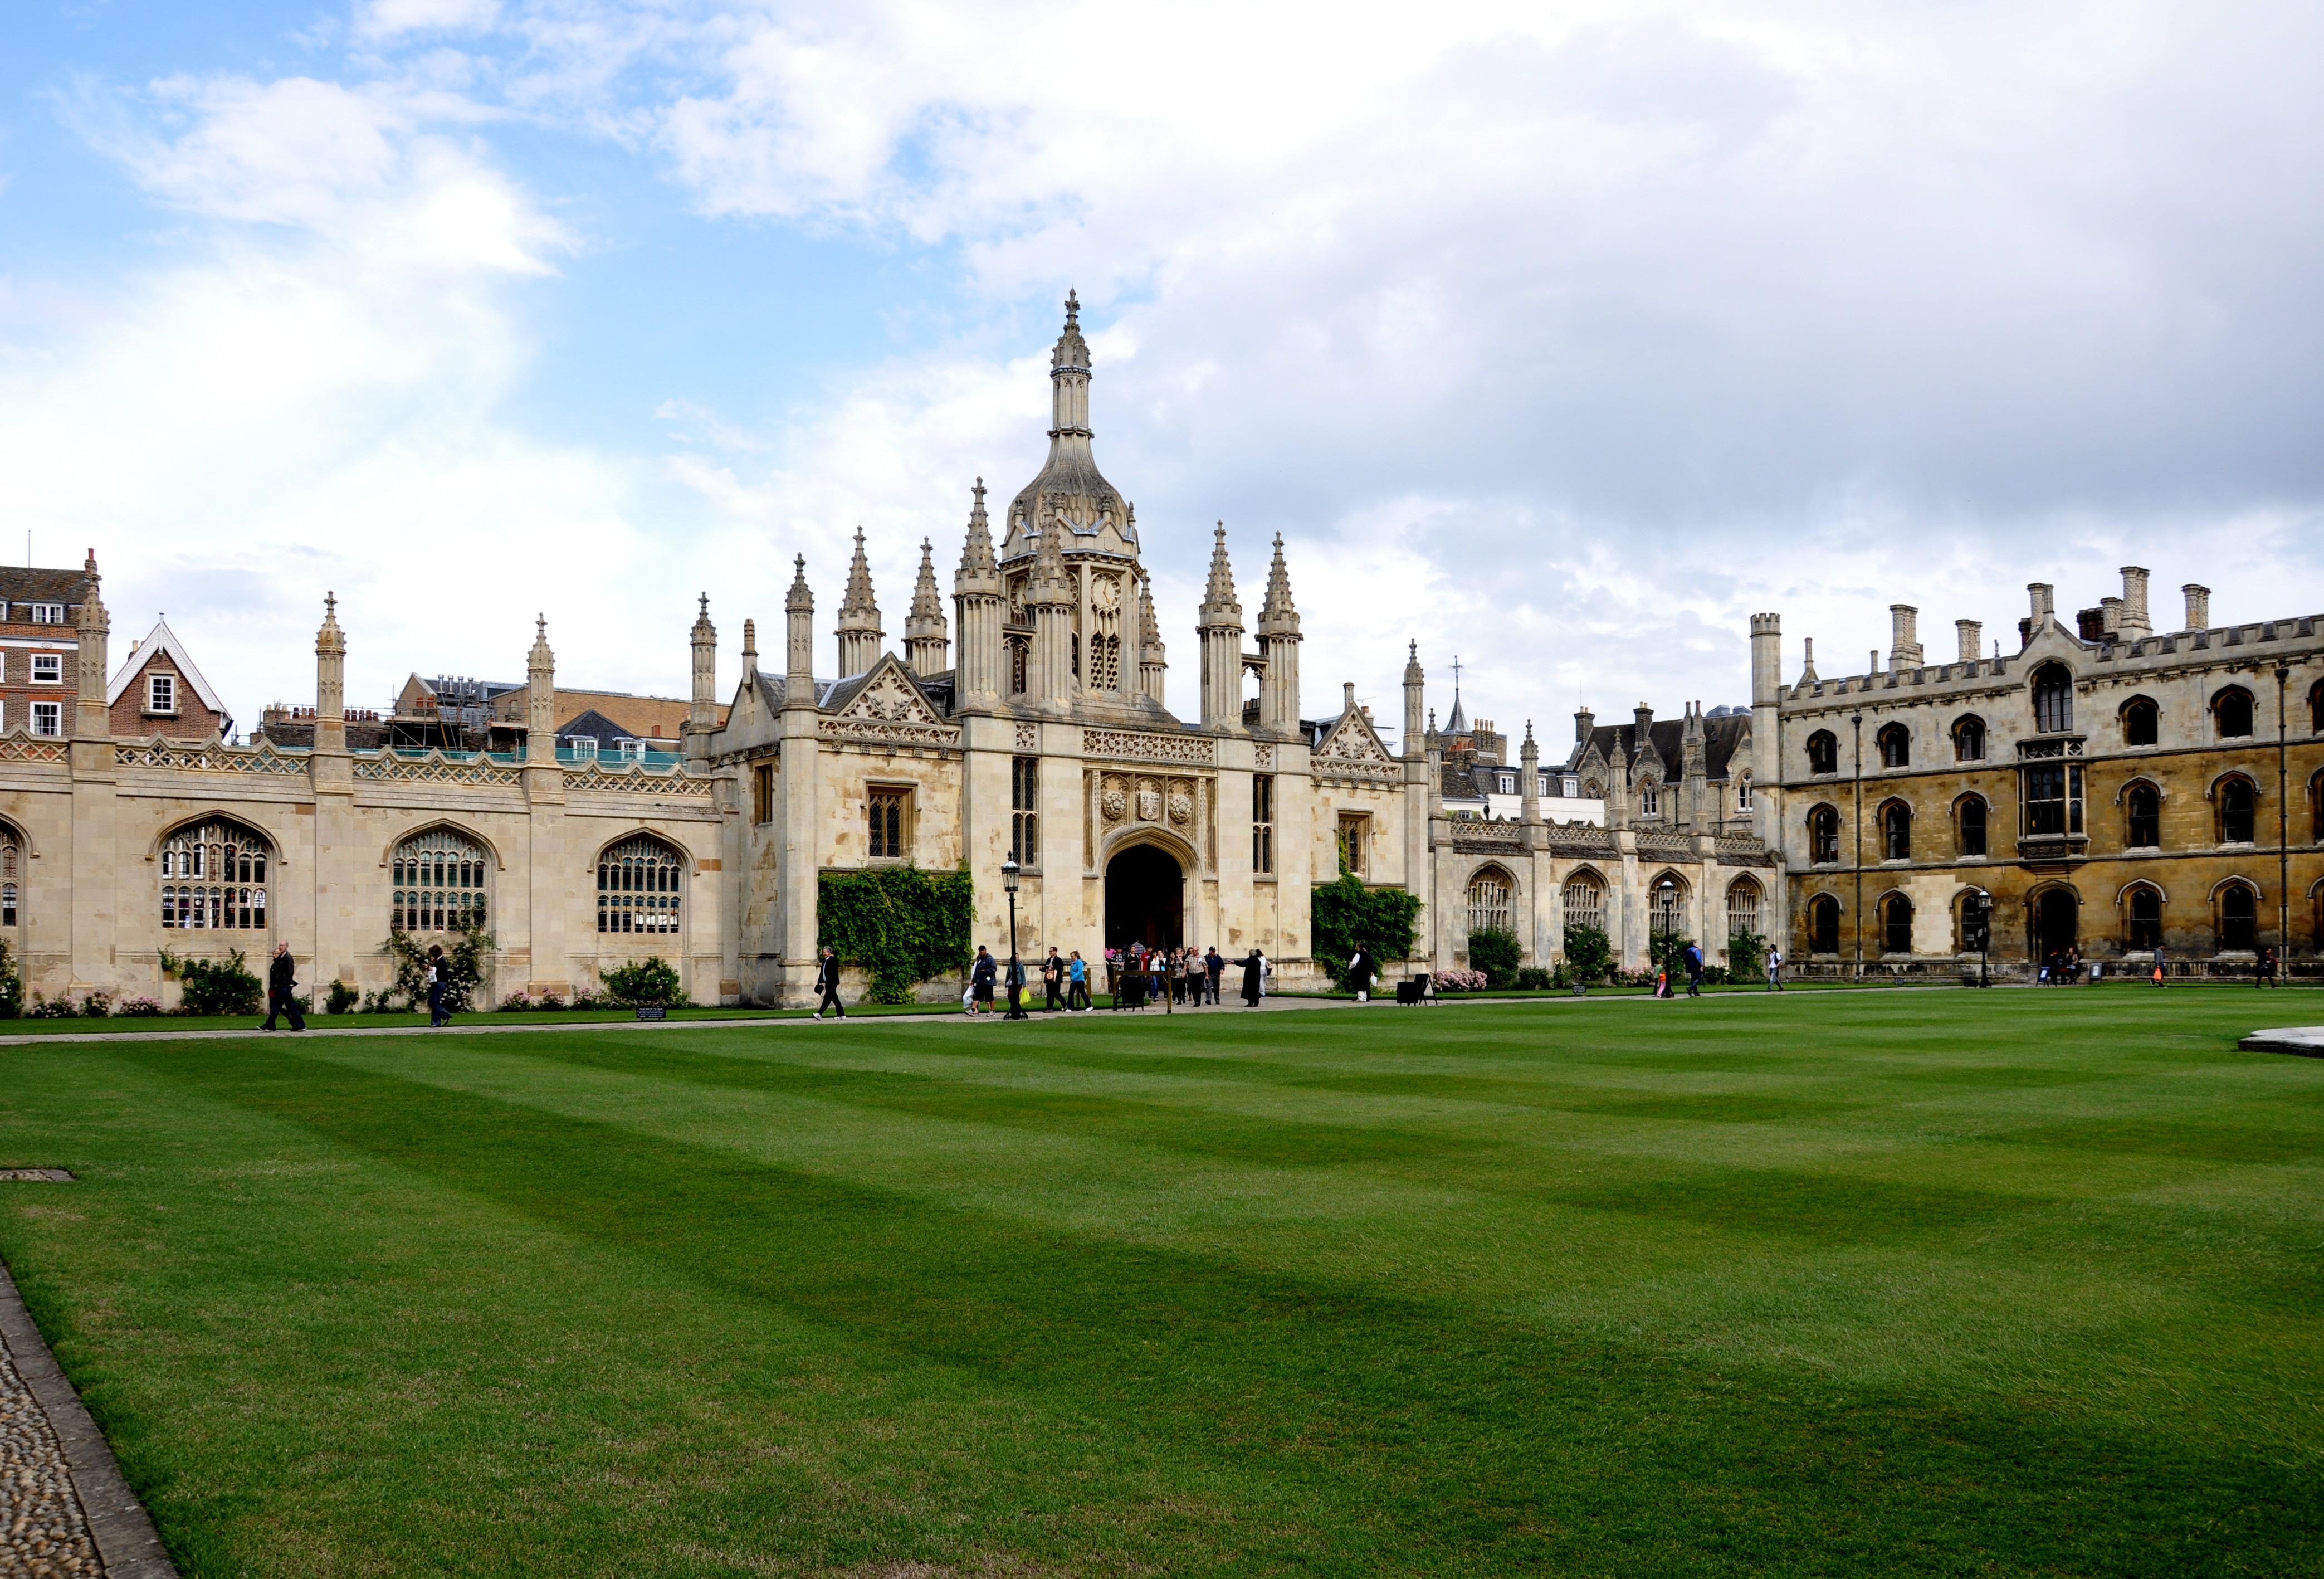 Cambridge_King's_College_2011_05.jpg